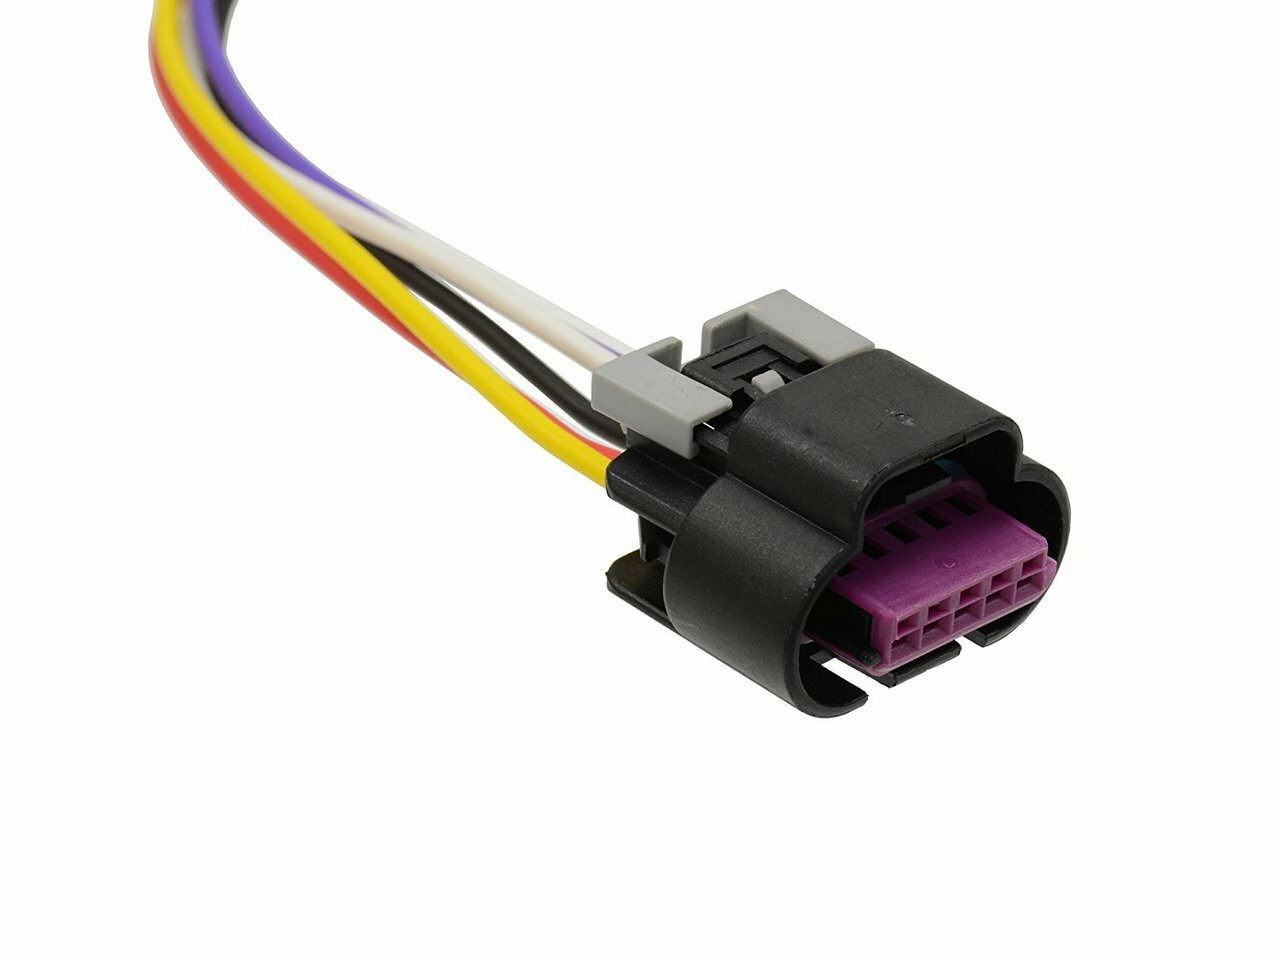 LS1 LT1 GM 3 Wire MAF MASS AIR FLOW Sensor Wiring Connector Pigtail Camaro LT4